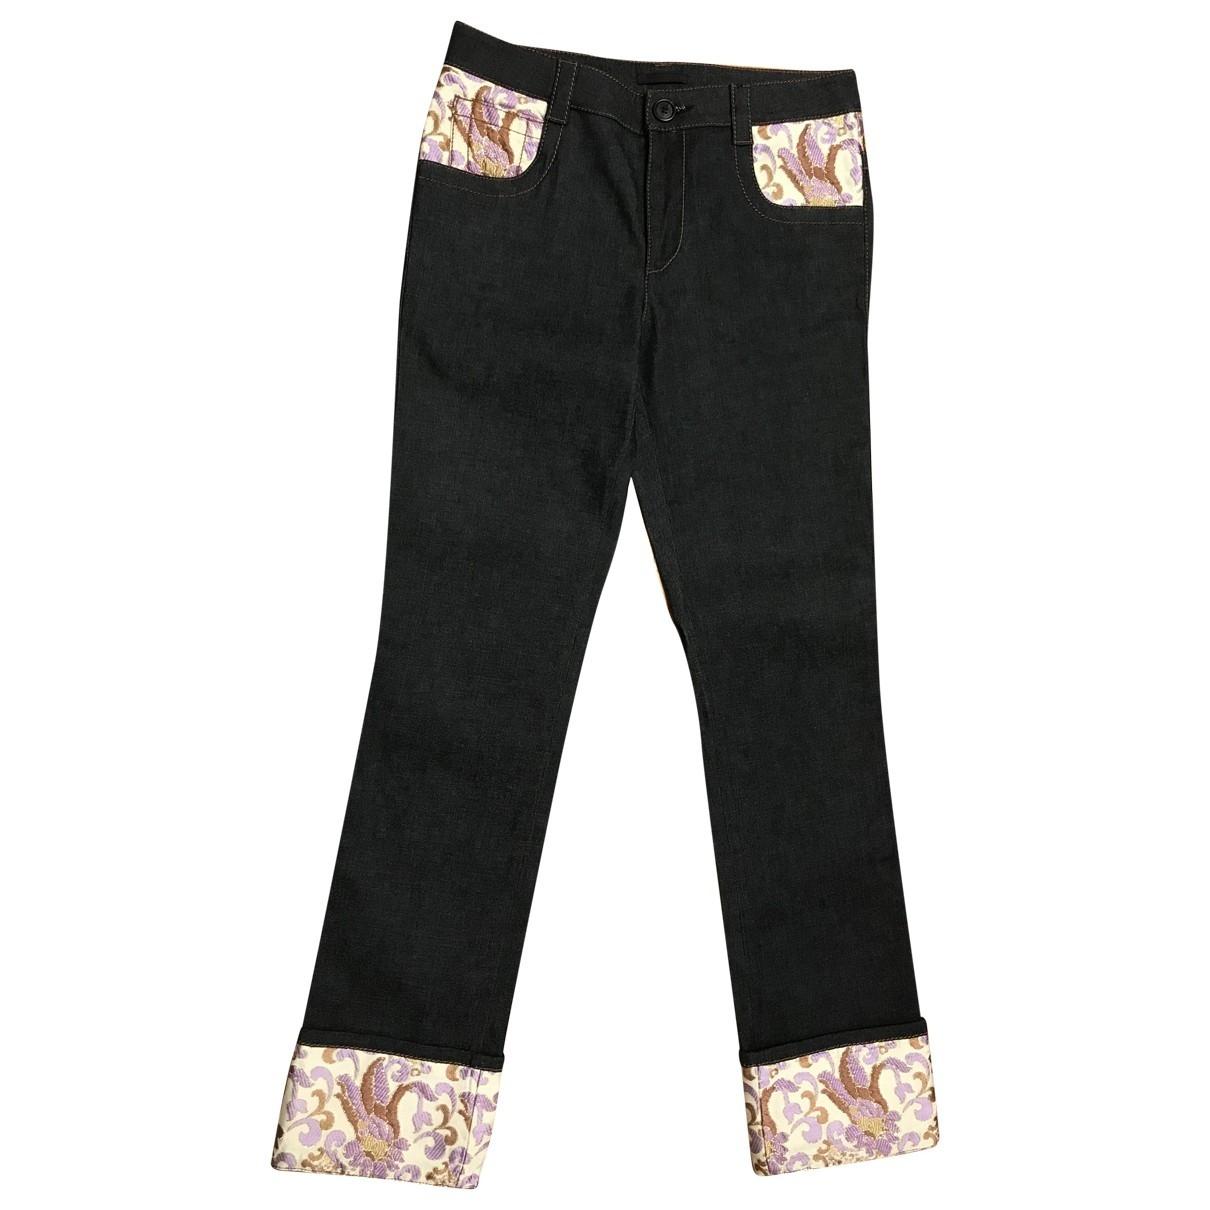 Prada \N Blue Denim - Jeans Trousers for Women 44 IT